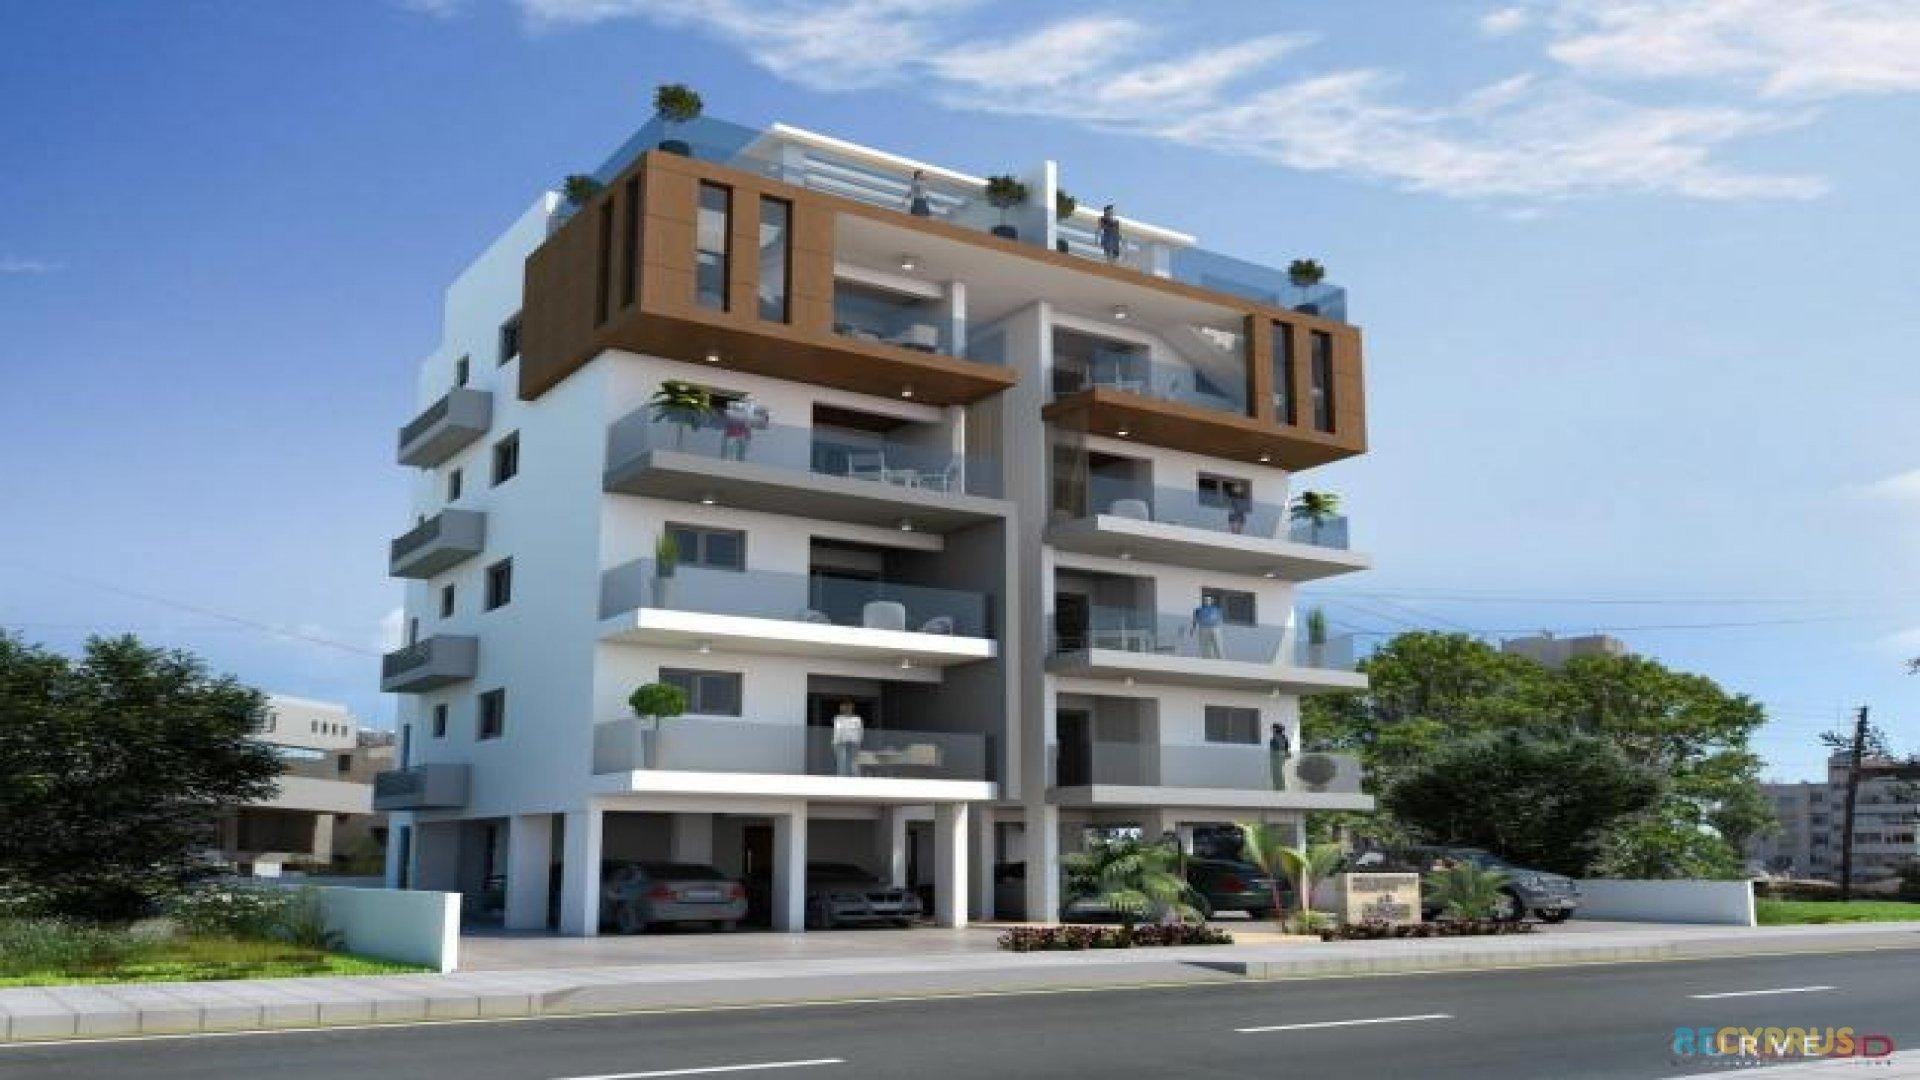 Apartment for sale City Center Larnaca Cyprus 11 3583